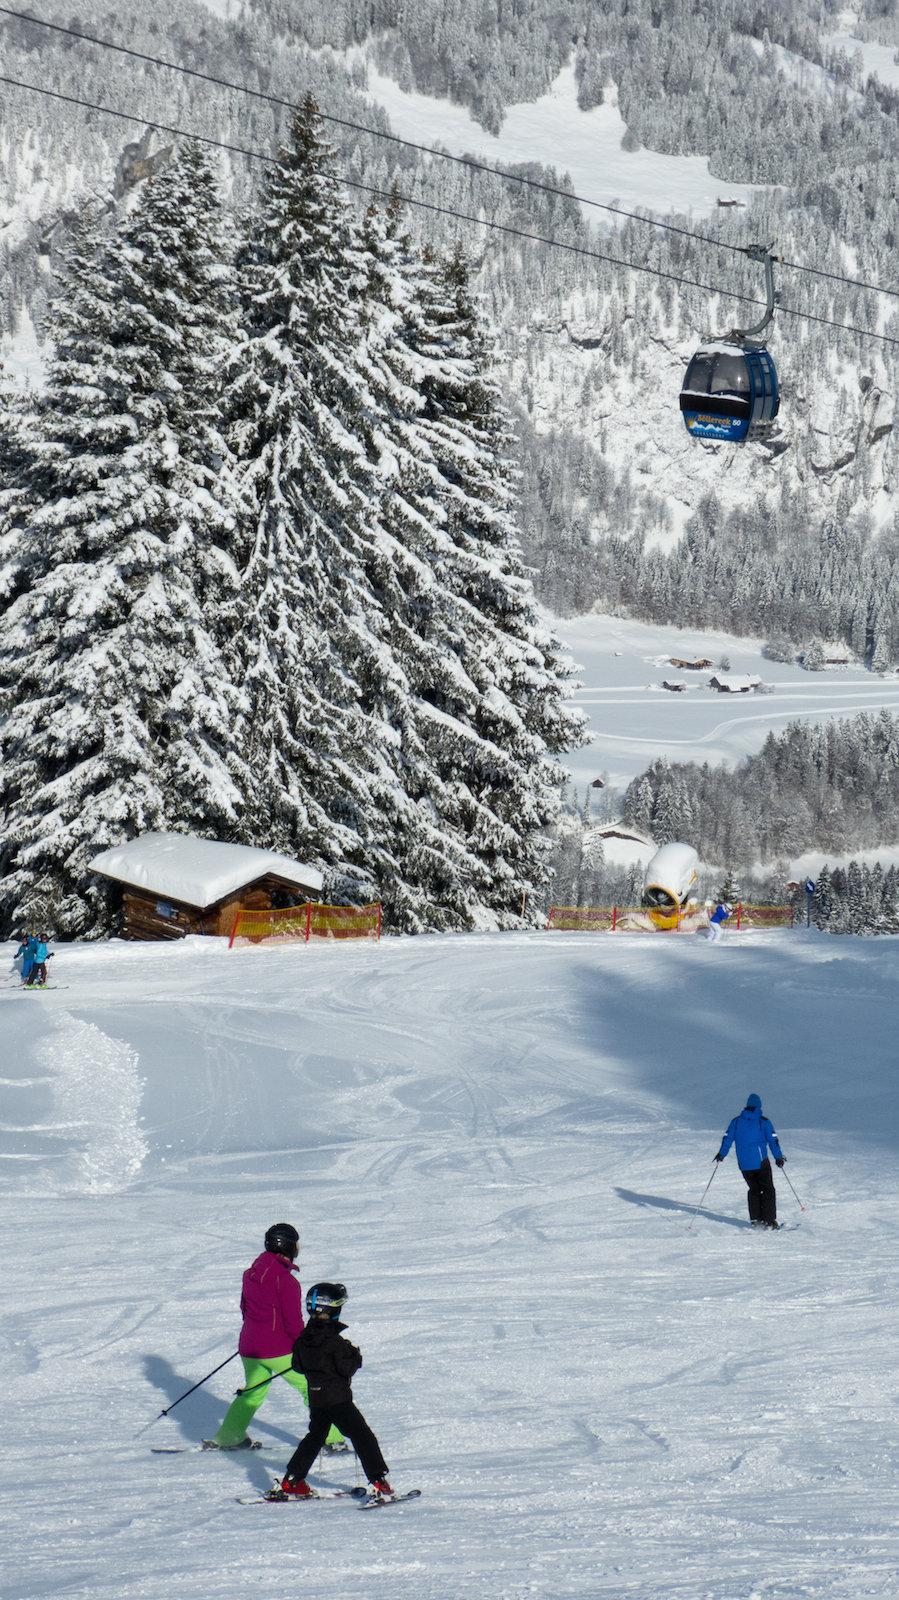 Familienskigebiet Söllereck - © Bergbahnen Oberstdorf/Kleinwalsertal